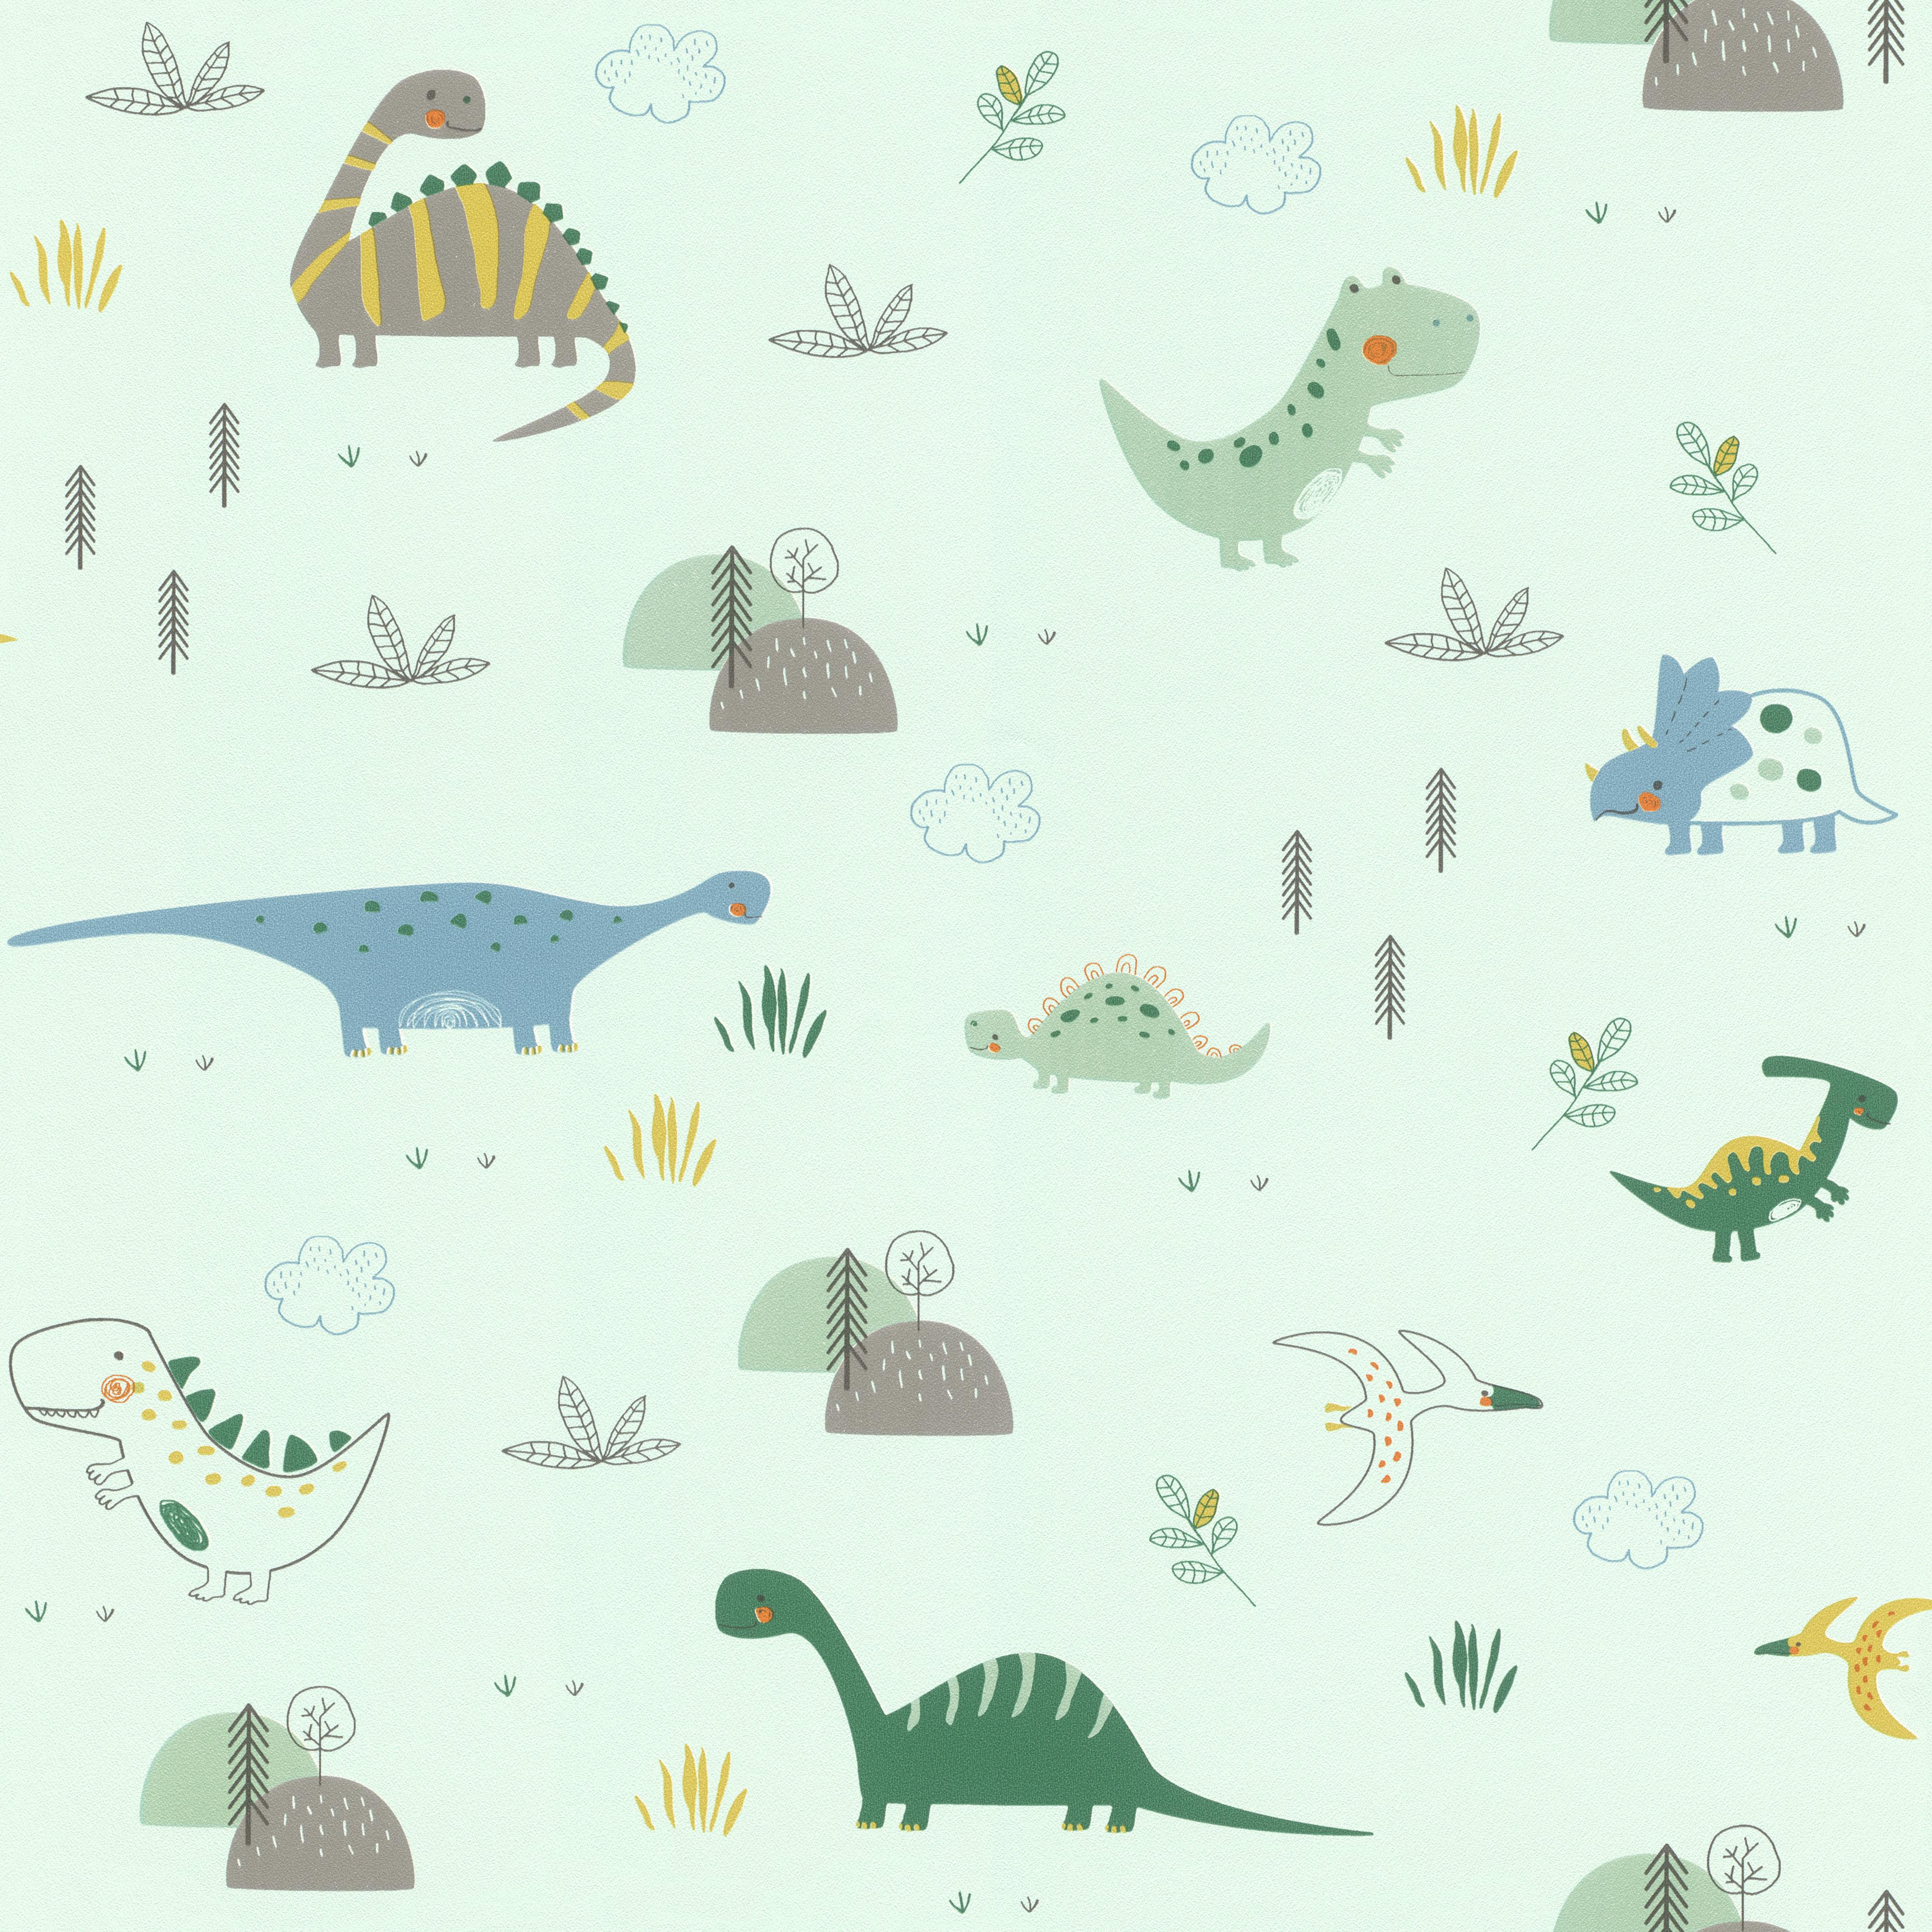 Zöld színű vidám dinós tapéta